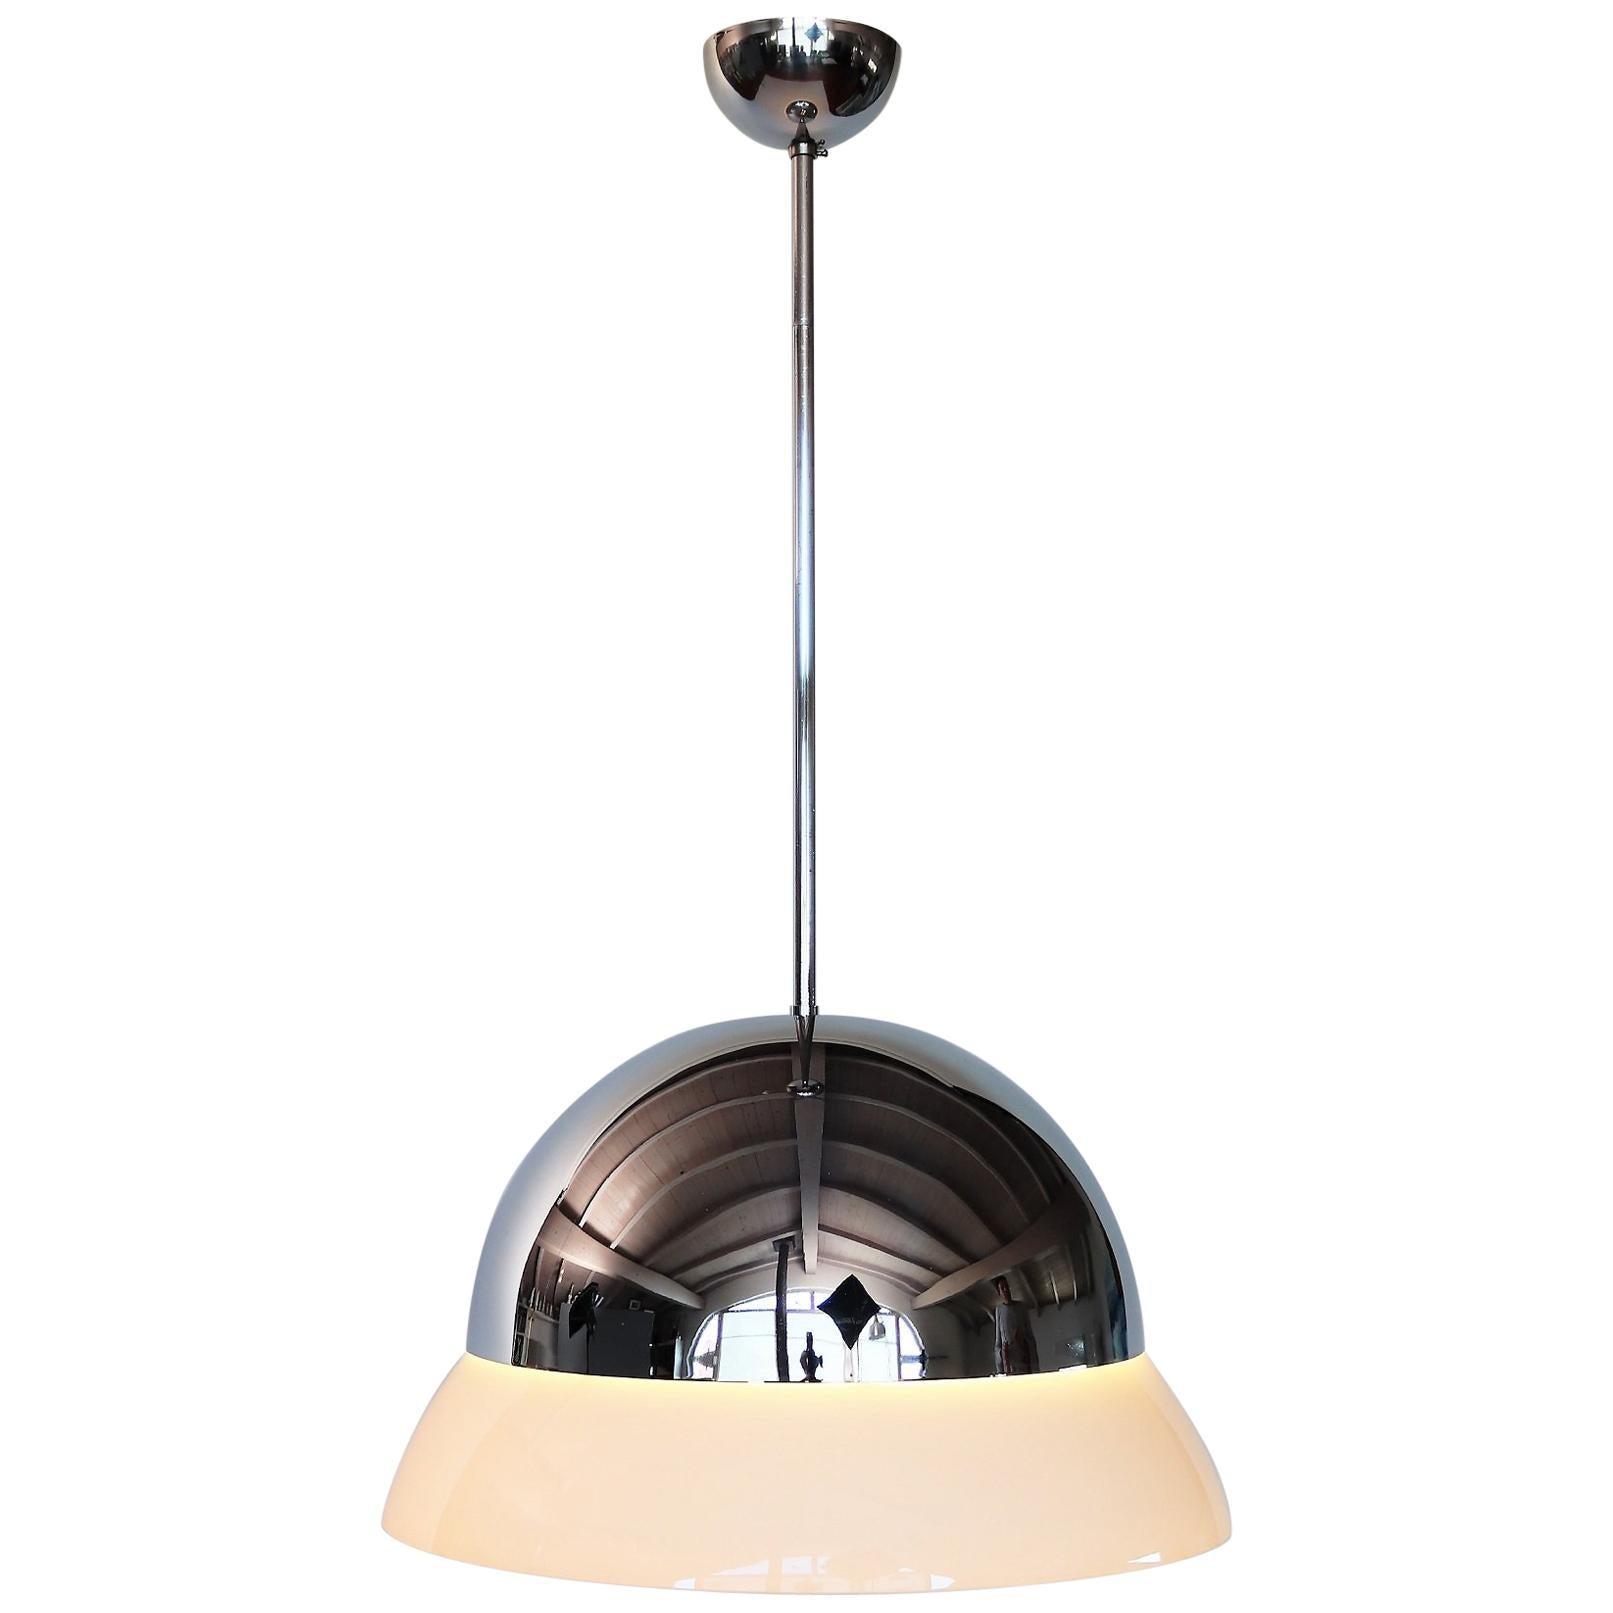 Italian Glass and Chrome Pendant Lamp CIRENE by Vico Magistretti for Artemide